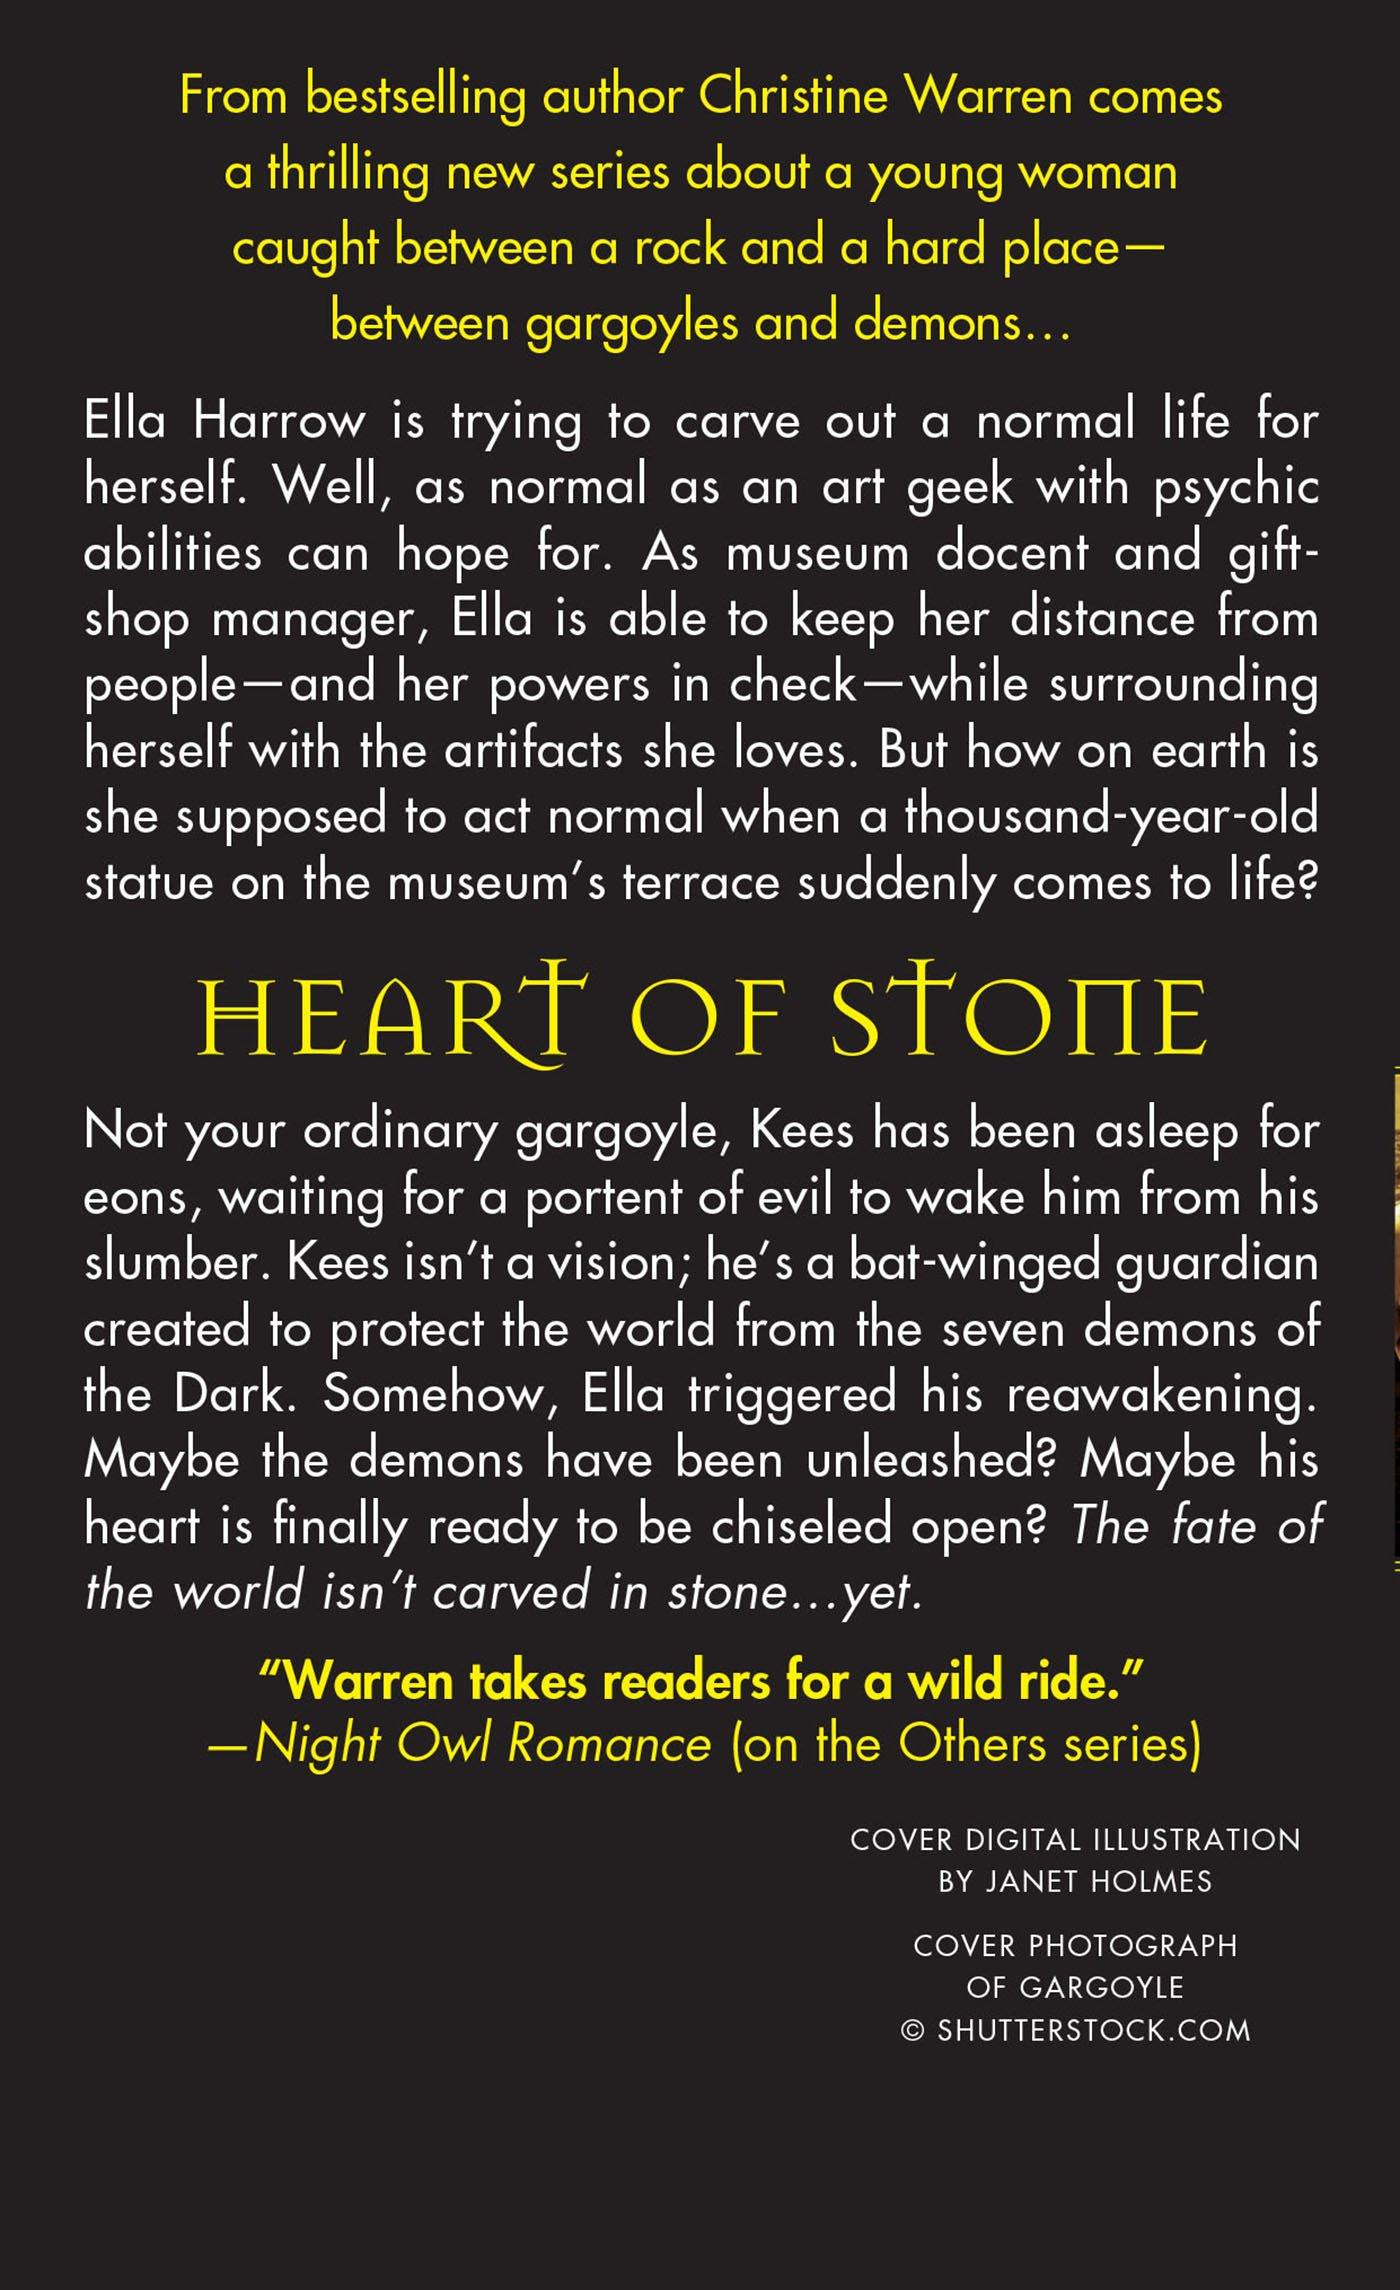 Heart of Stone: A Beauty and Beast Novel (Gargoyles Series) by St. Martin's Paperbacks